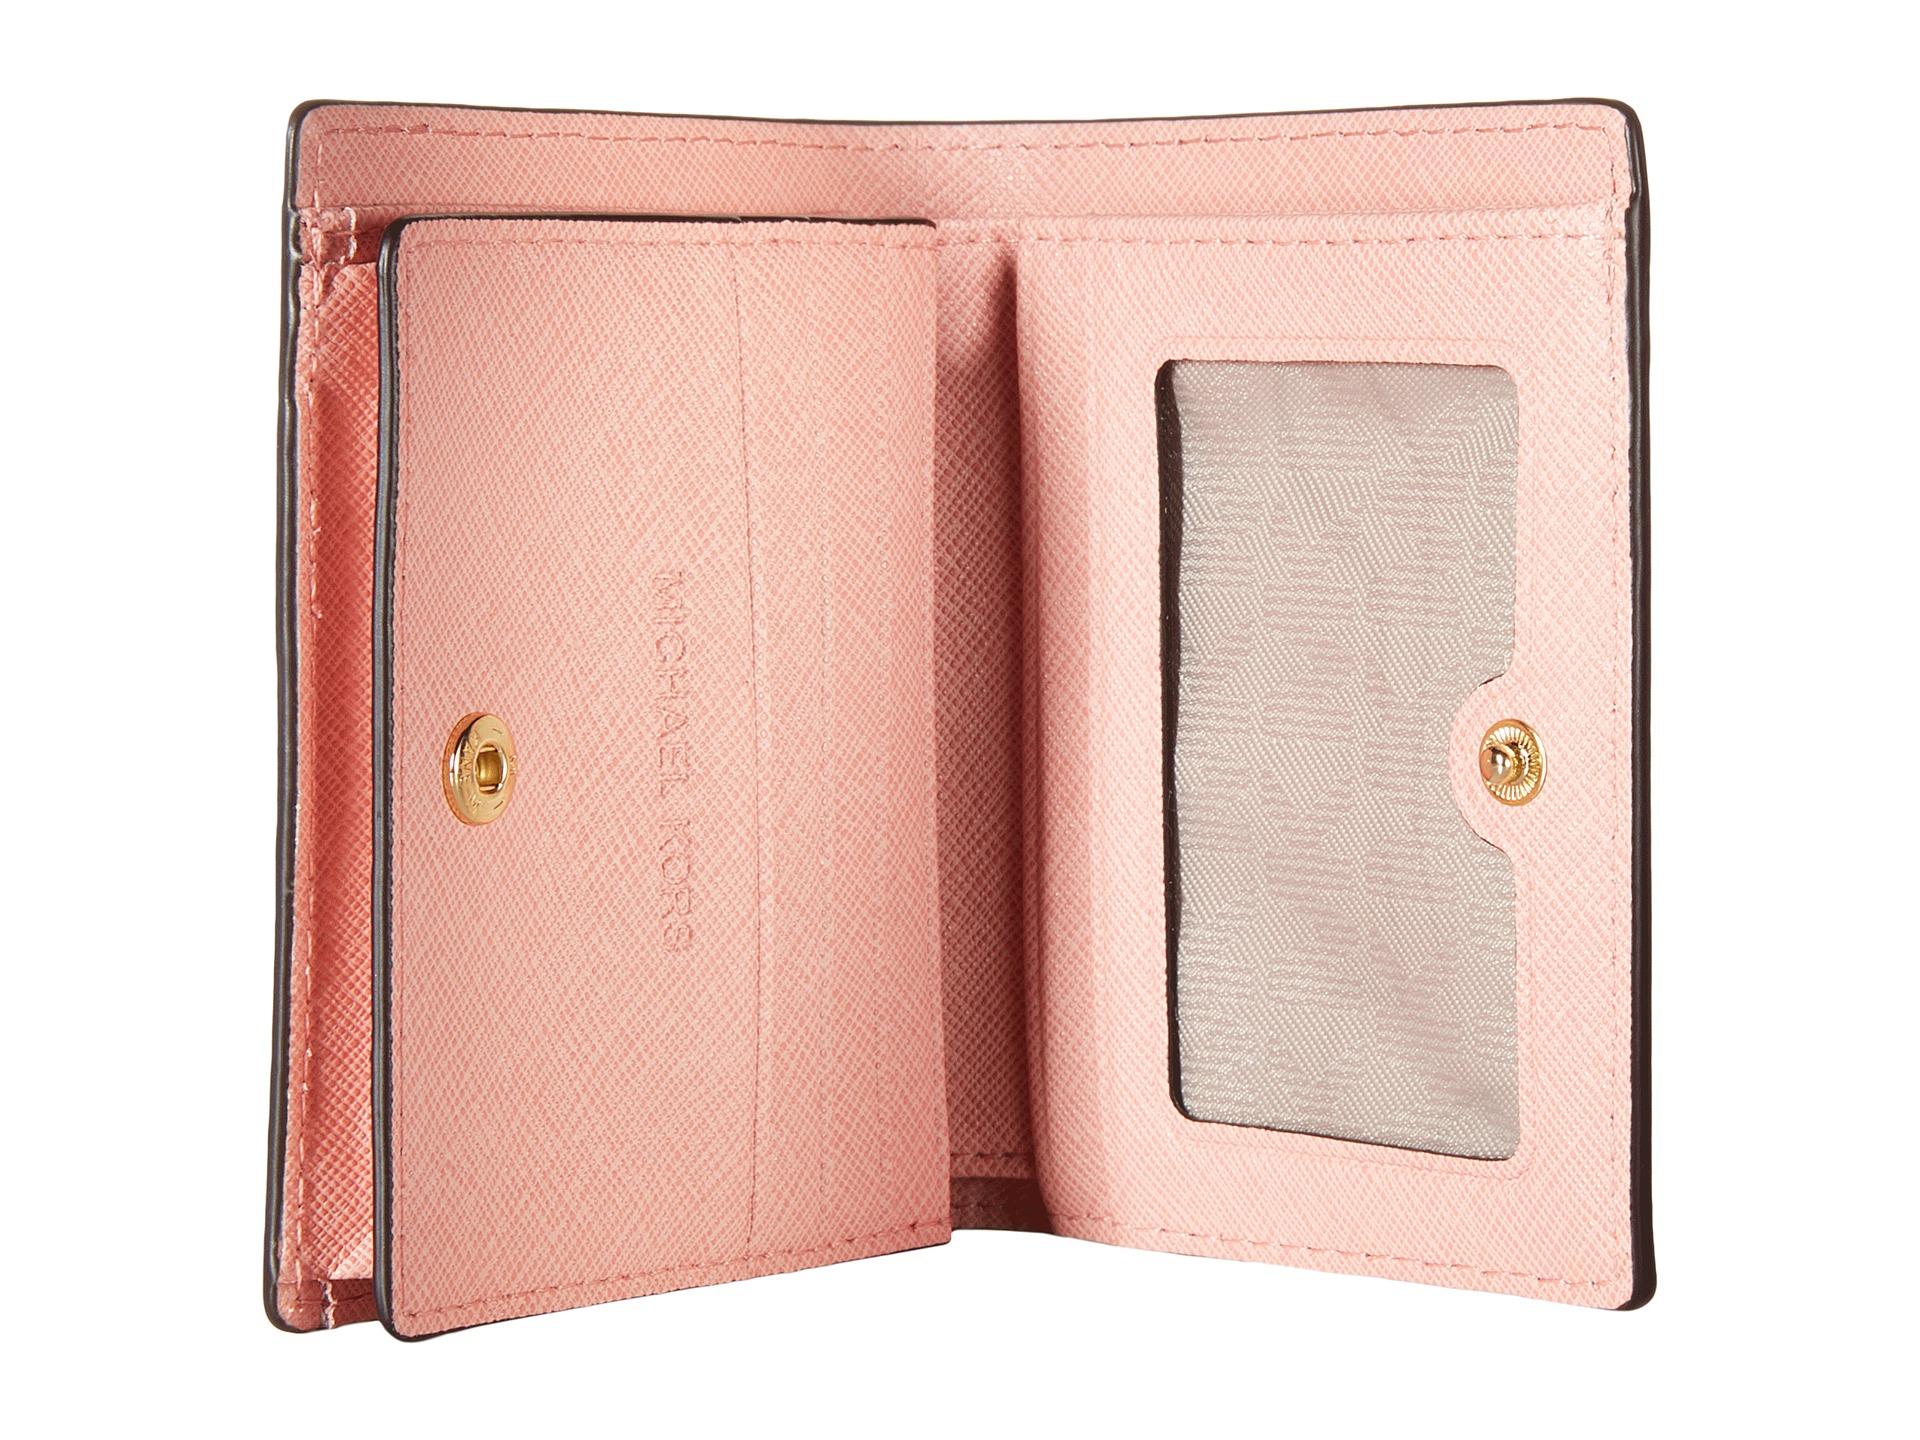 955d25e1807c5 Lyst - MICHAEL Michael Kors Jet Set Travel Flap Card Holder in Pink